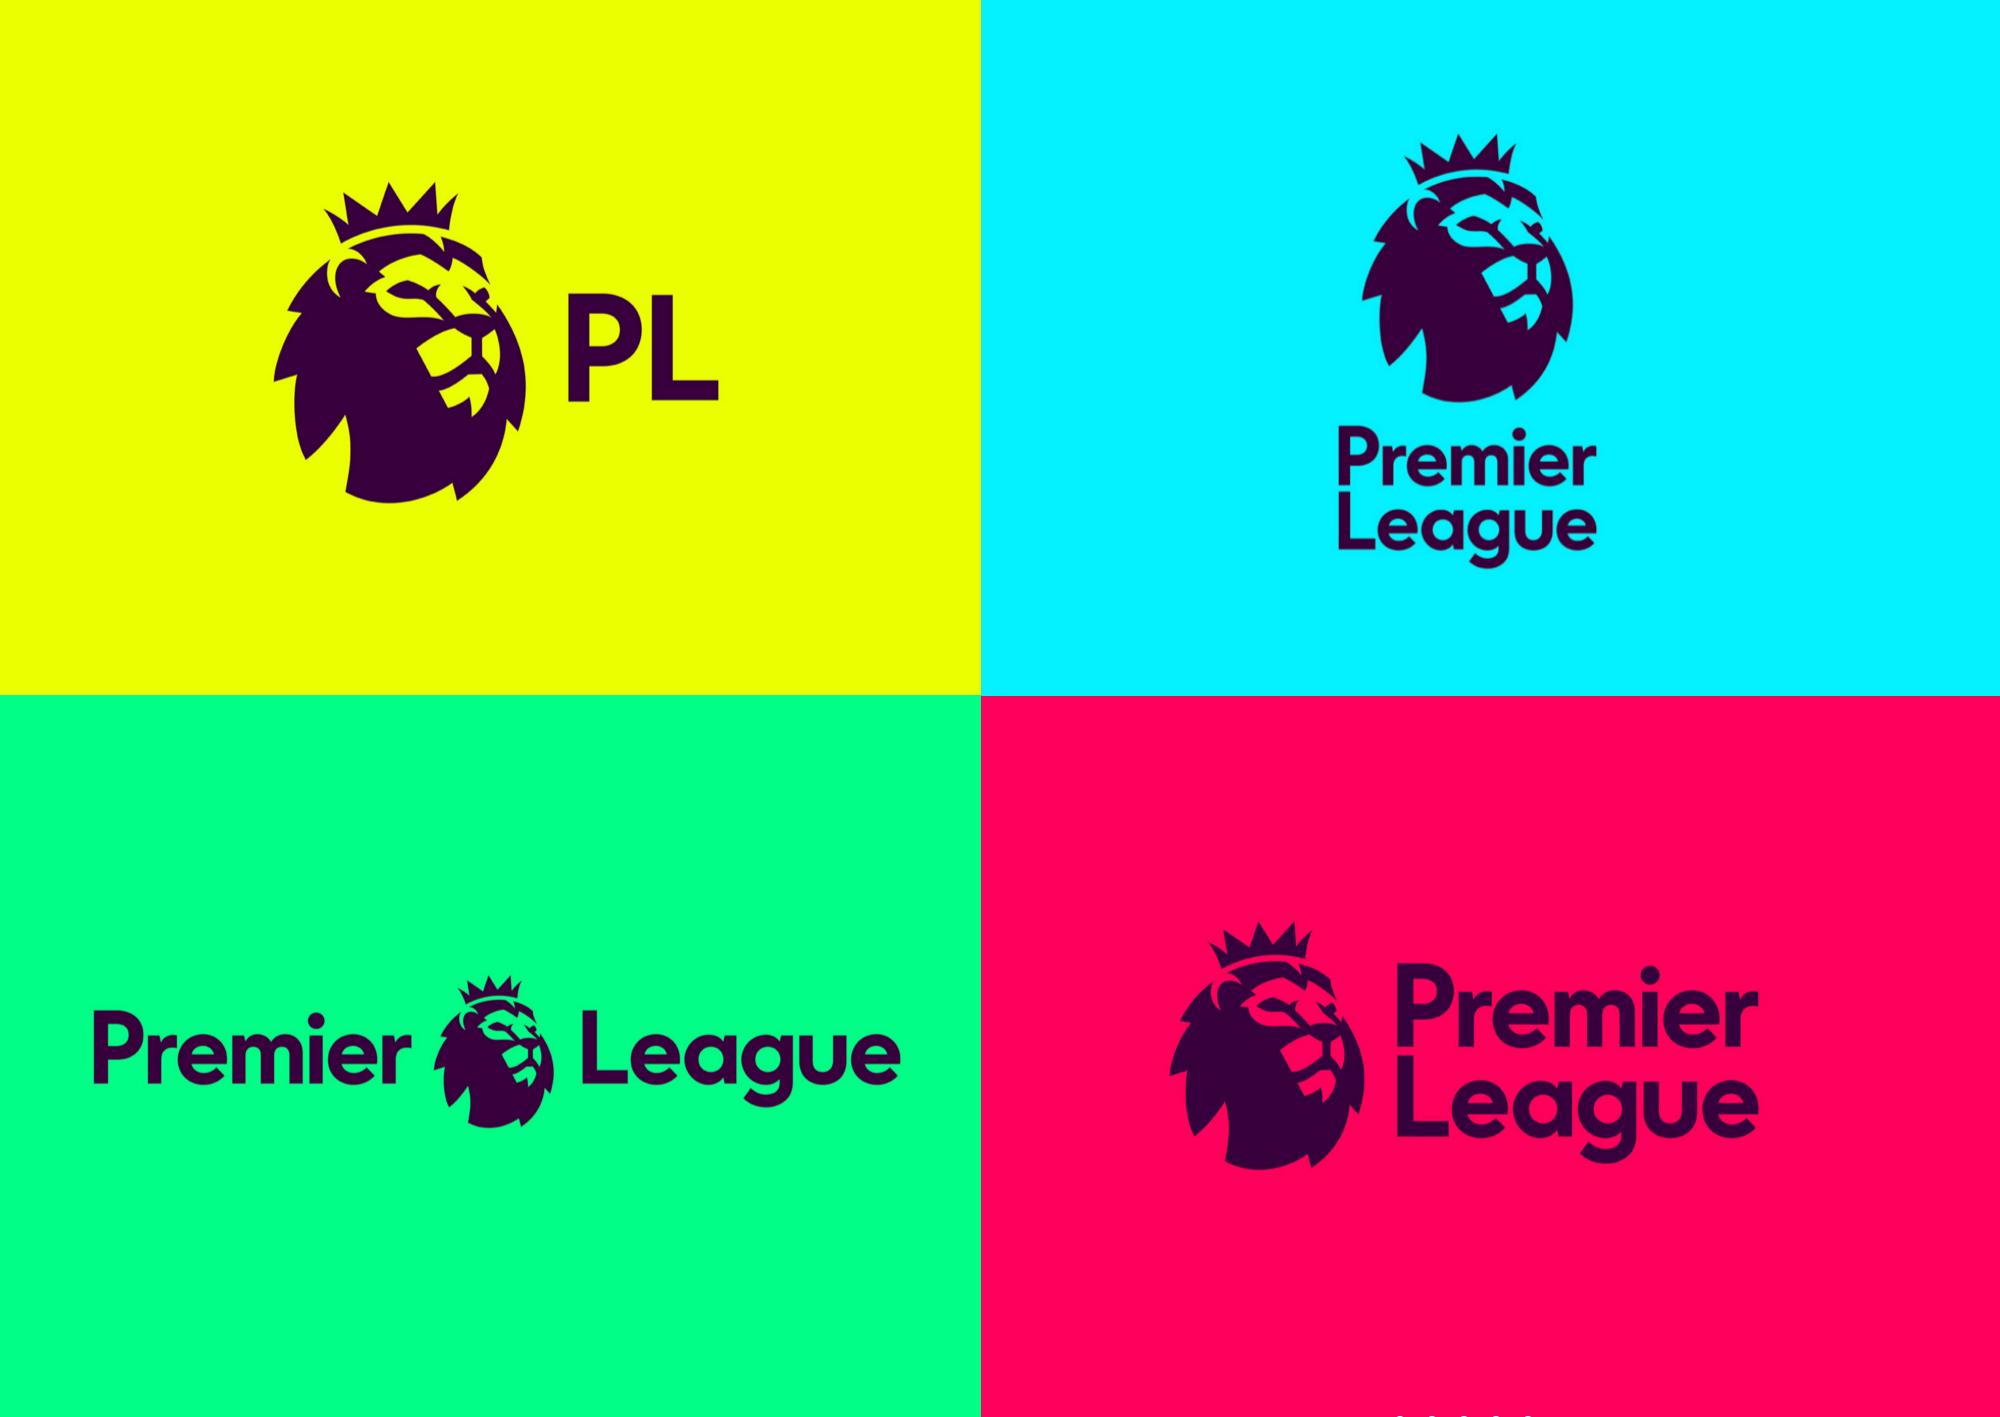 Арсенал, Тоттенхэм, Манчестер Юнайтед, Челси, Ньюкасл, Ливерпуль, Манчестер Сити